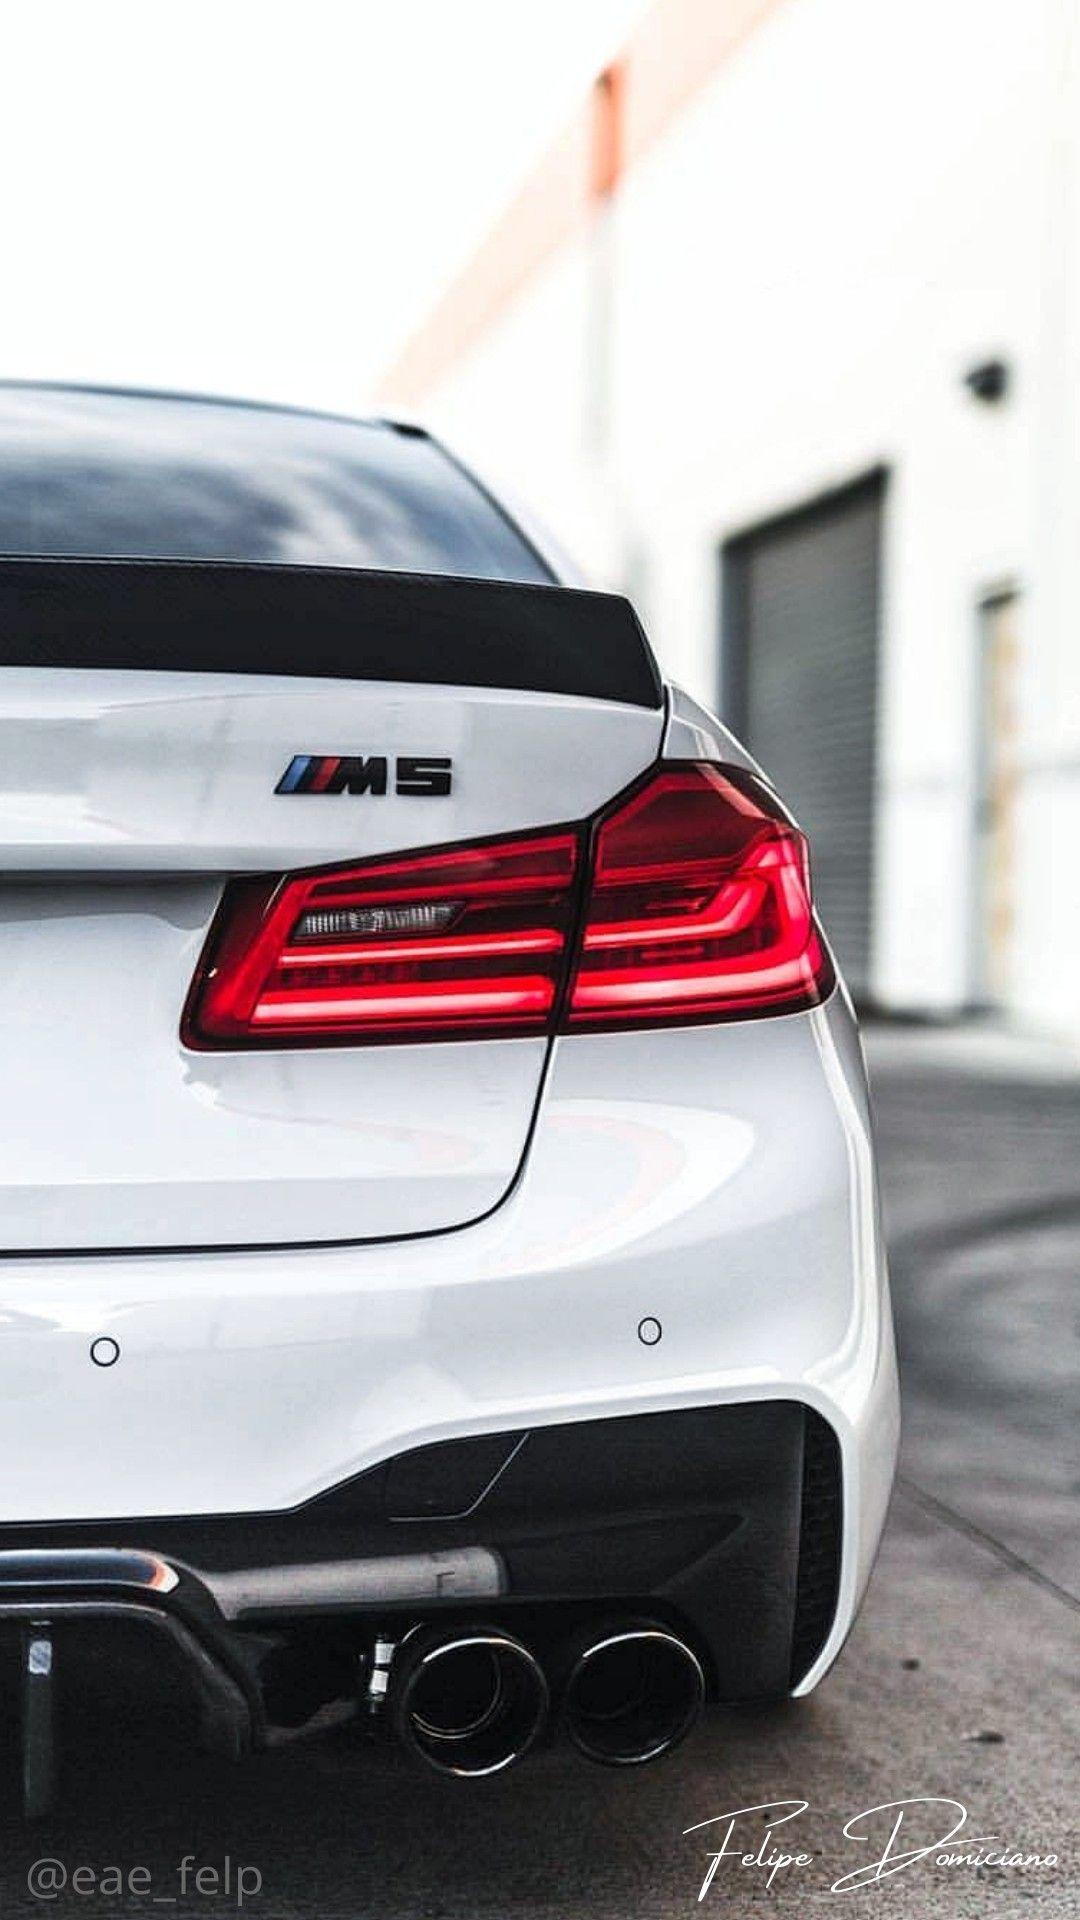 M5 Wallpaper Bmw Sports Car Dream Cars Bmw Bmw Wallpapers